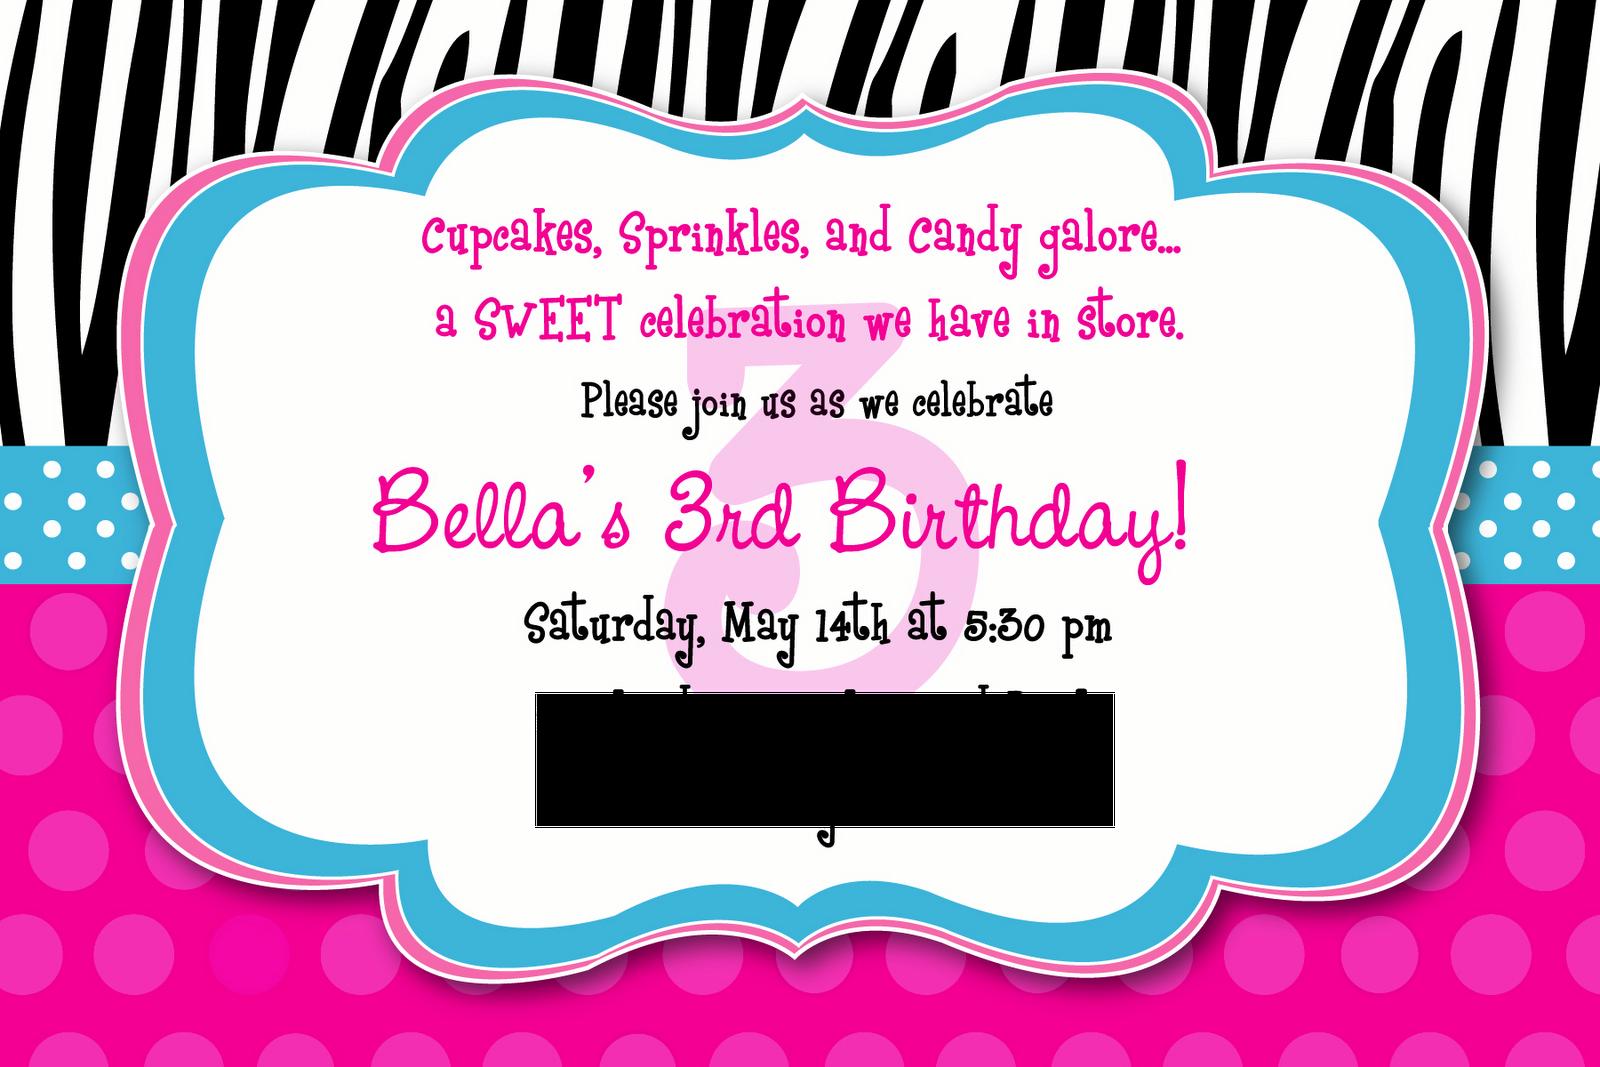 Bits of Splendor: Bella's 3rd Birthday PARTY!